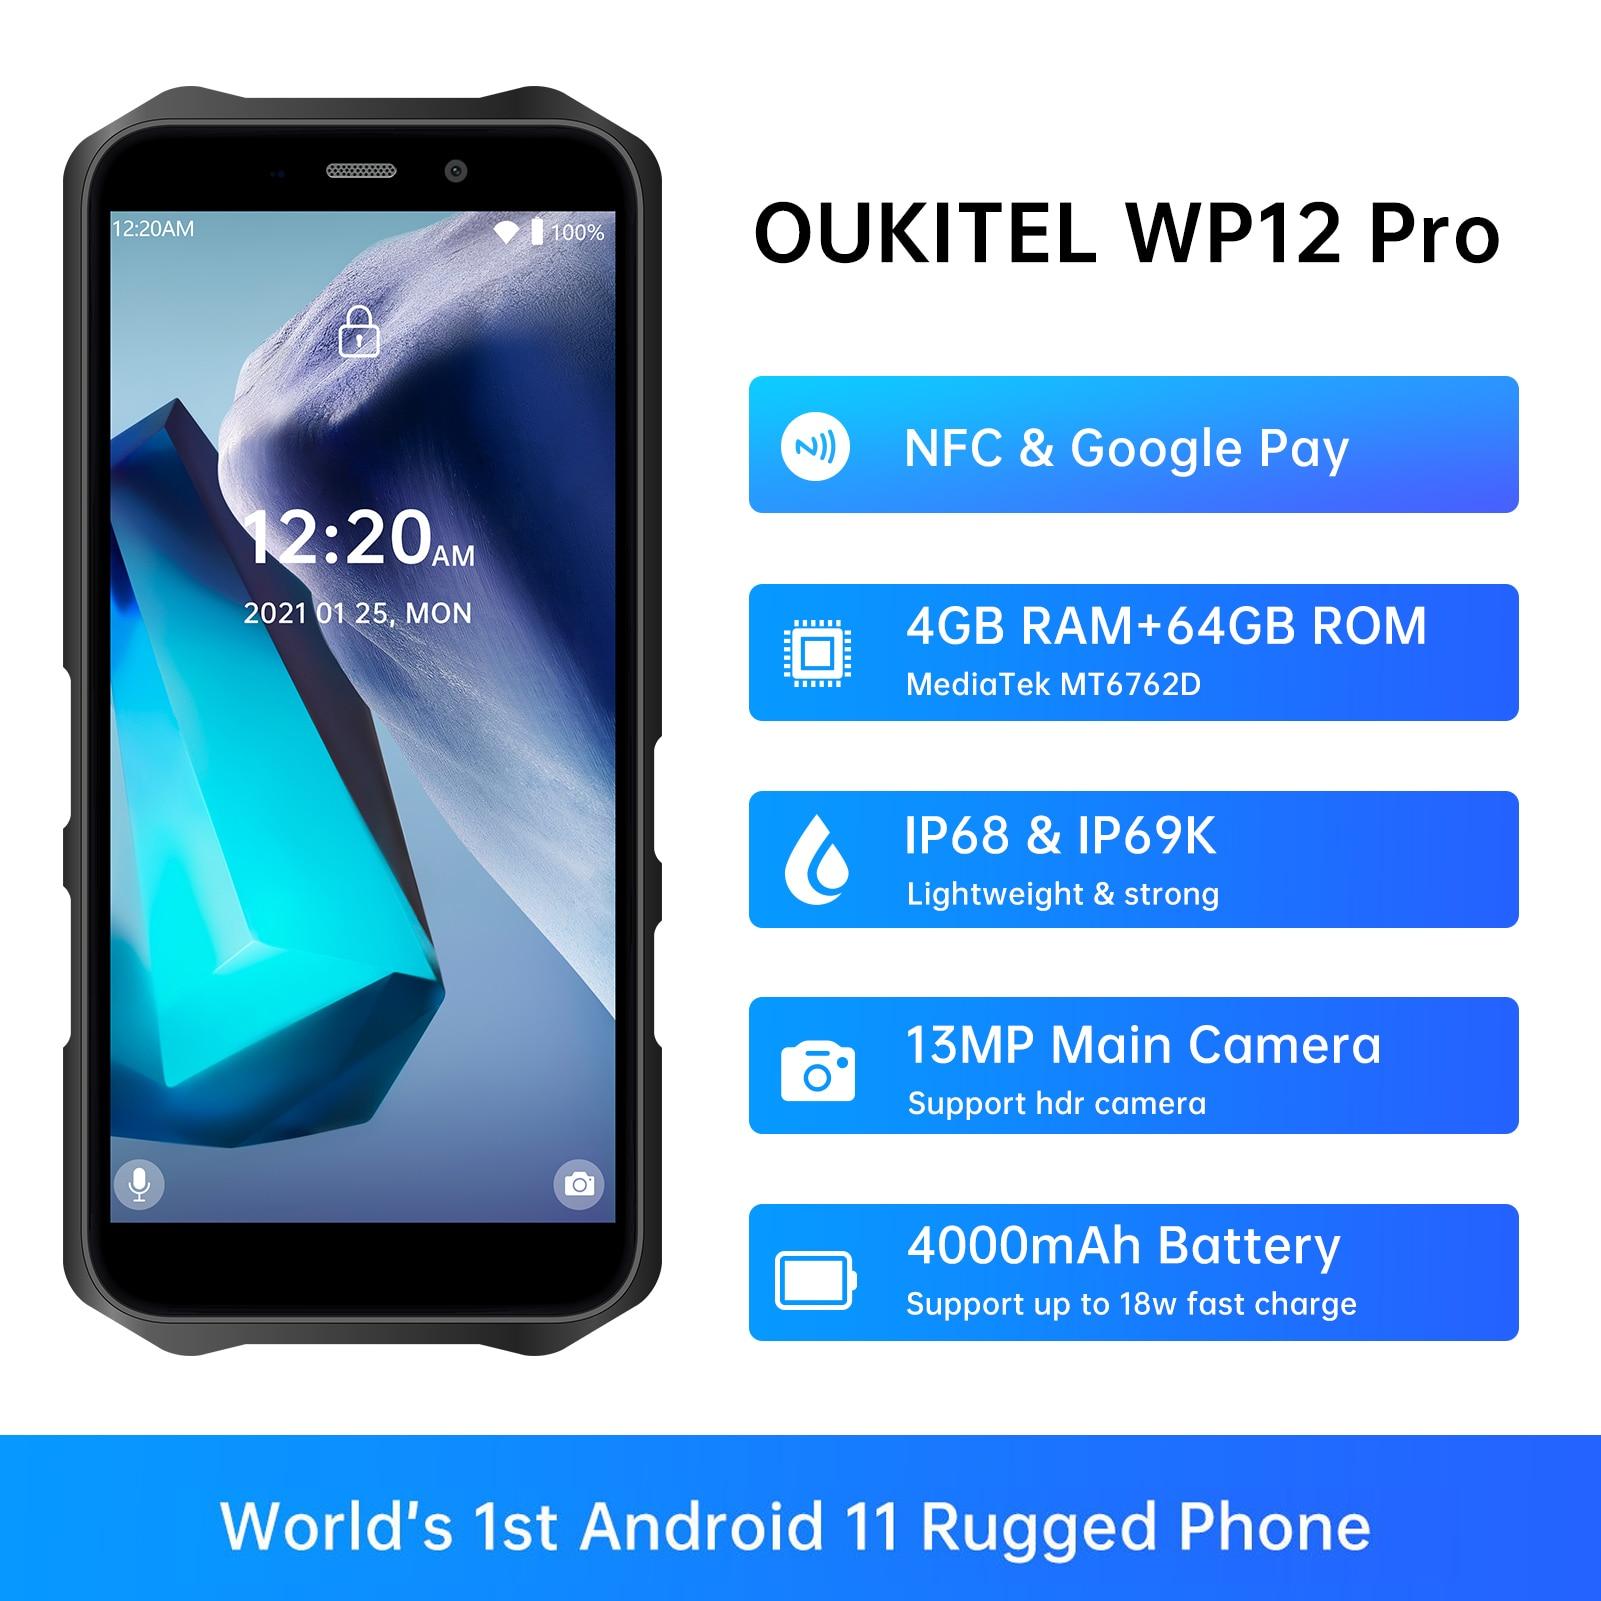 OUKITEL WP12 Pro IP68 водонепроницаемый прочный смартфон 4 Гб + 64 ГБ Android 11 5,5 дюйм HD + 4000 мАч NFC мобильный телефон четырехъядерный телефон